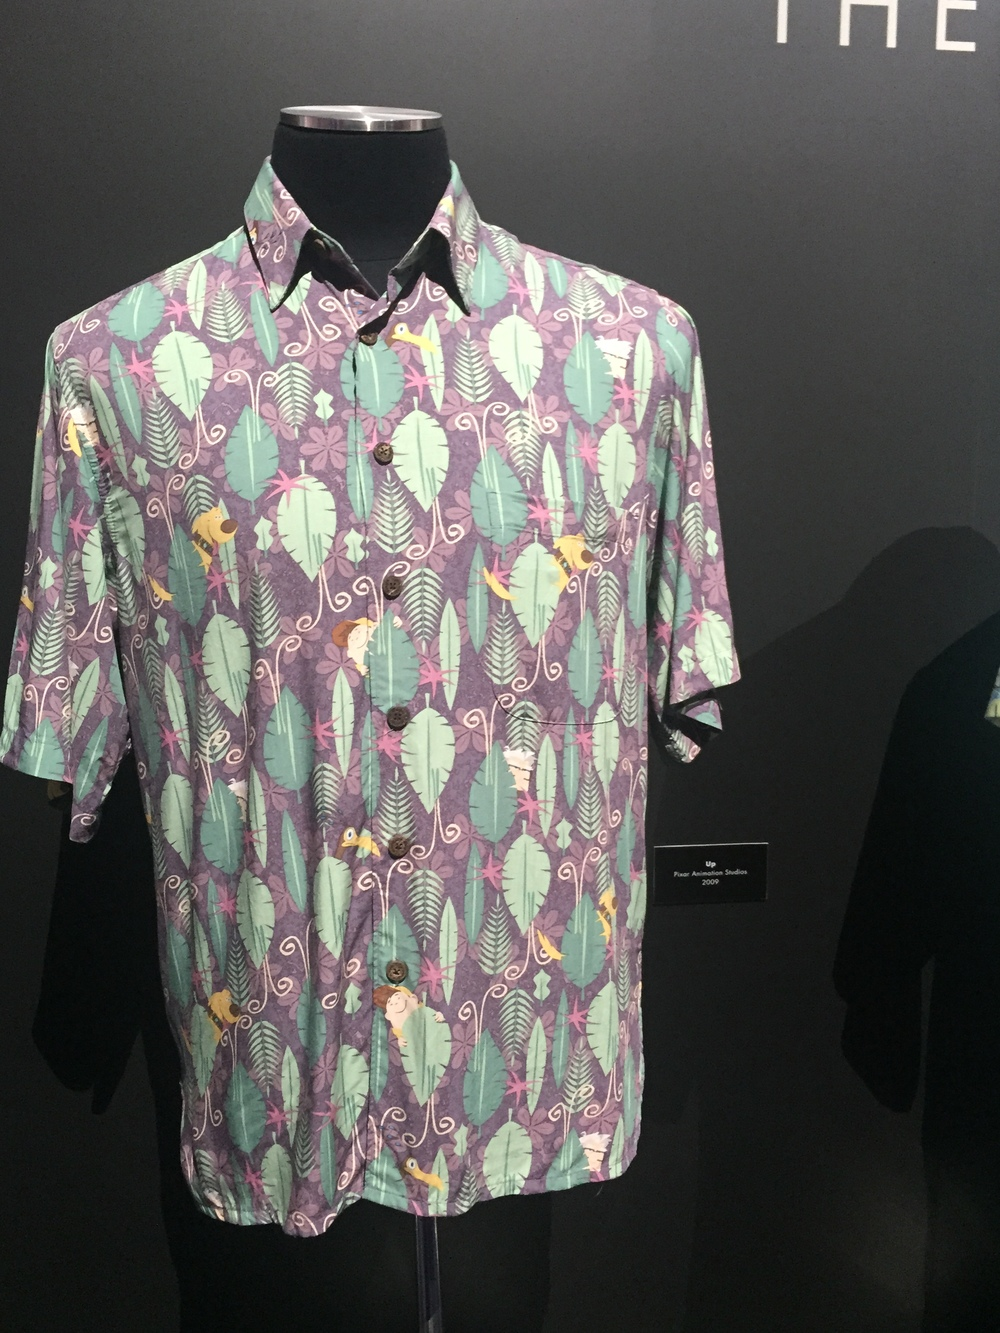 Lasseter Shirts 6.JPG